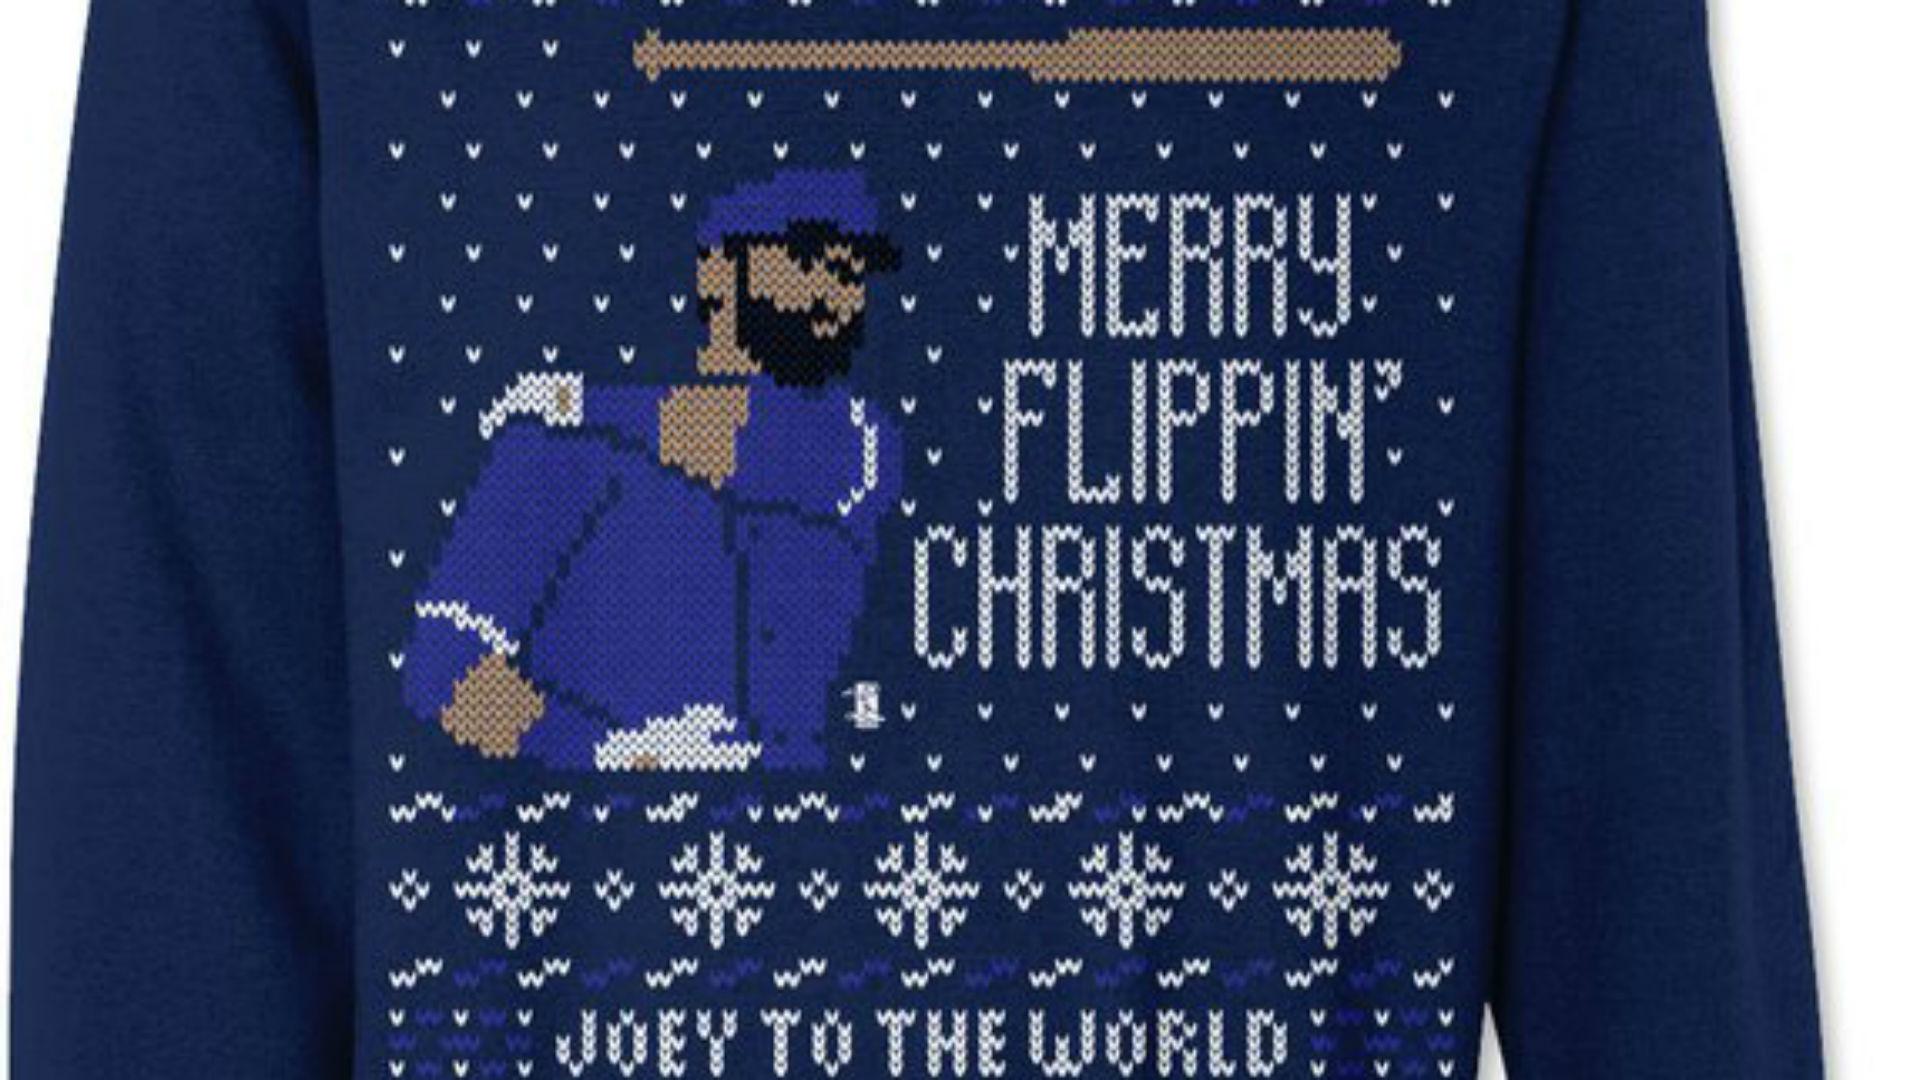 jose bautistas bat flip immortalized on ugly christmas sweater mlb sporting news - Christmas Sweater Wallpaper